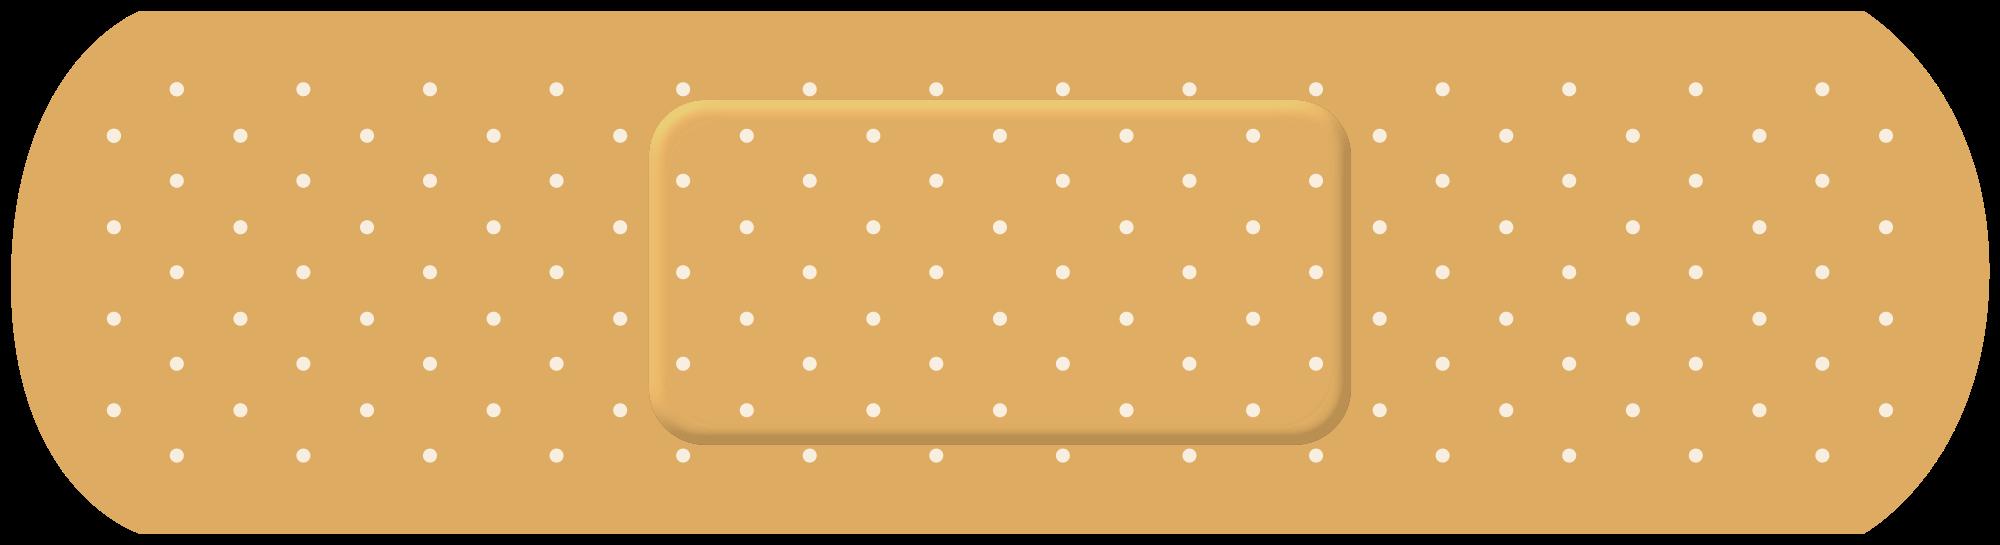 2000x545 Fileadhesive Bandage Drawing Nevit.svg